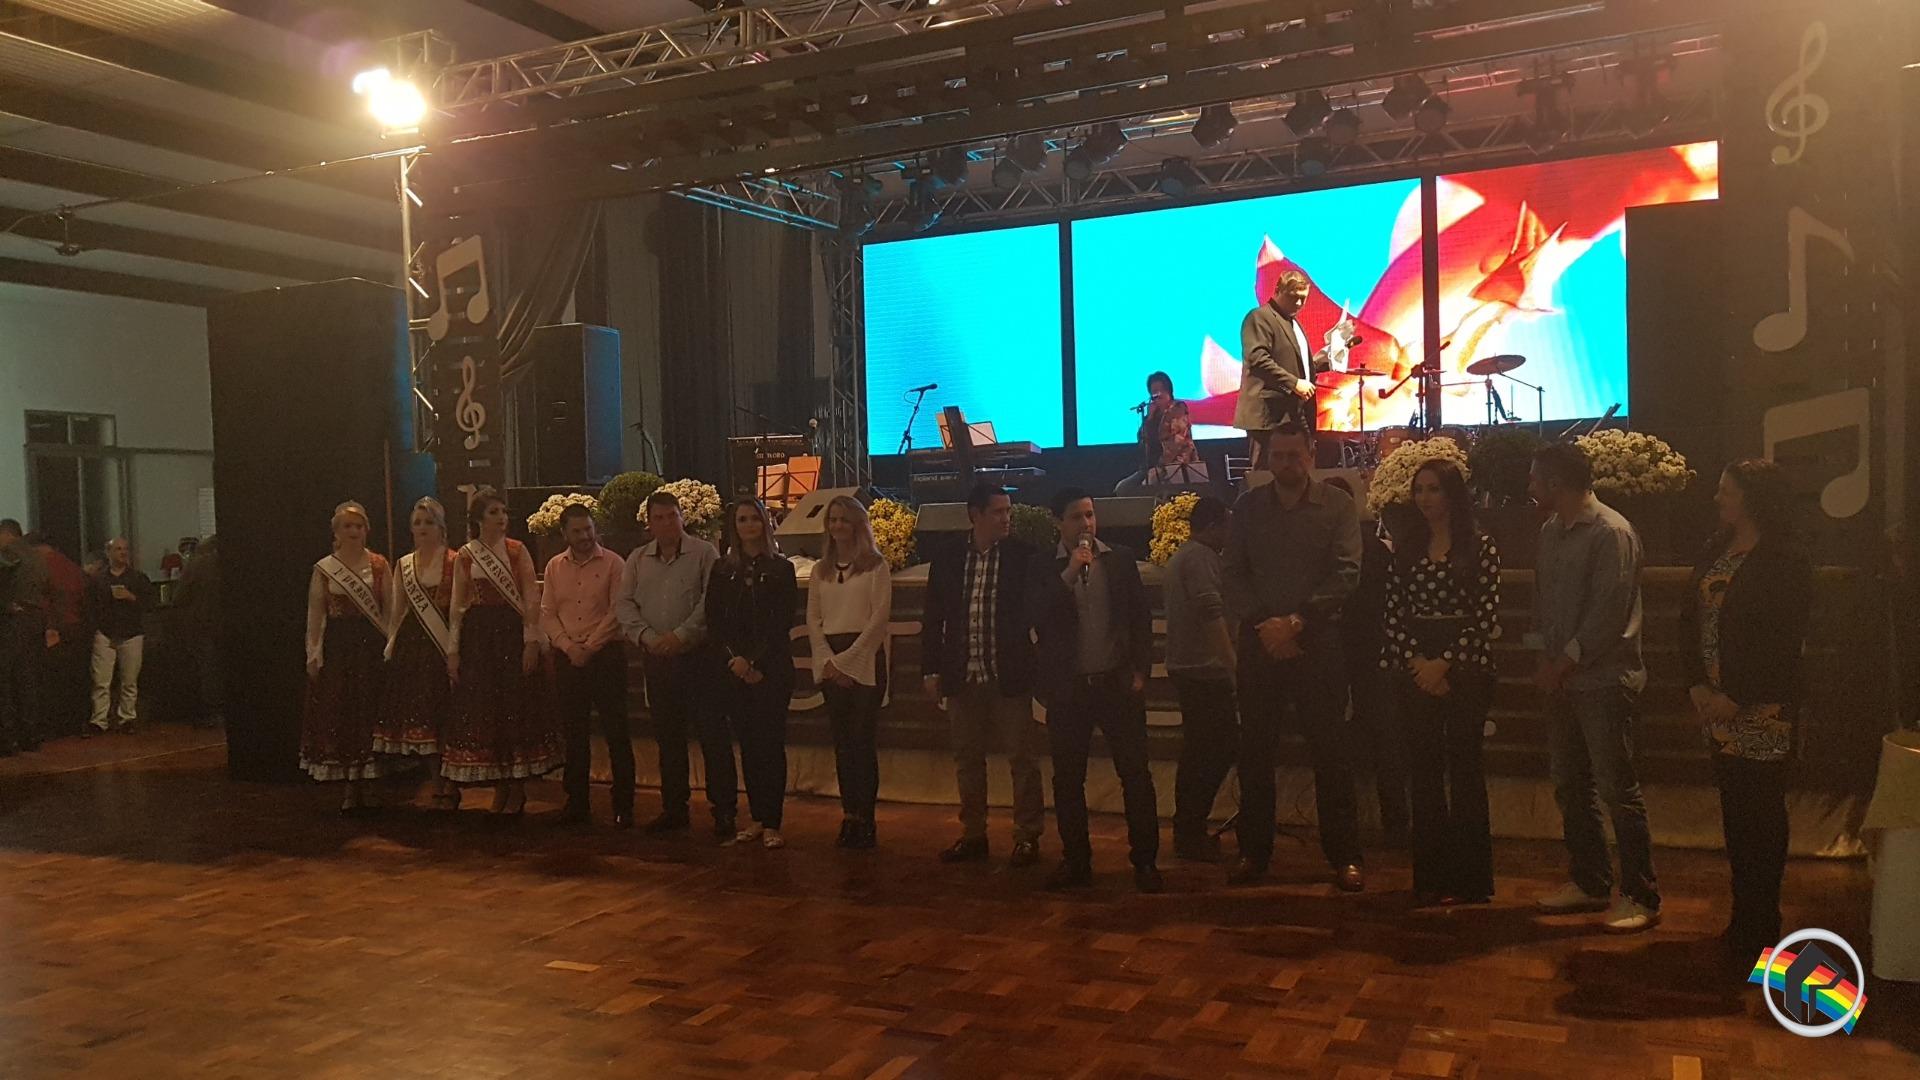 24 º Festioeste distribui R$ 10 mil em prêmios